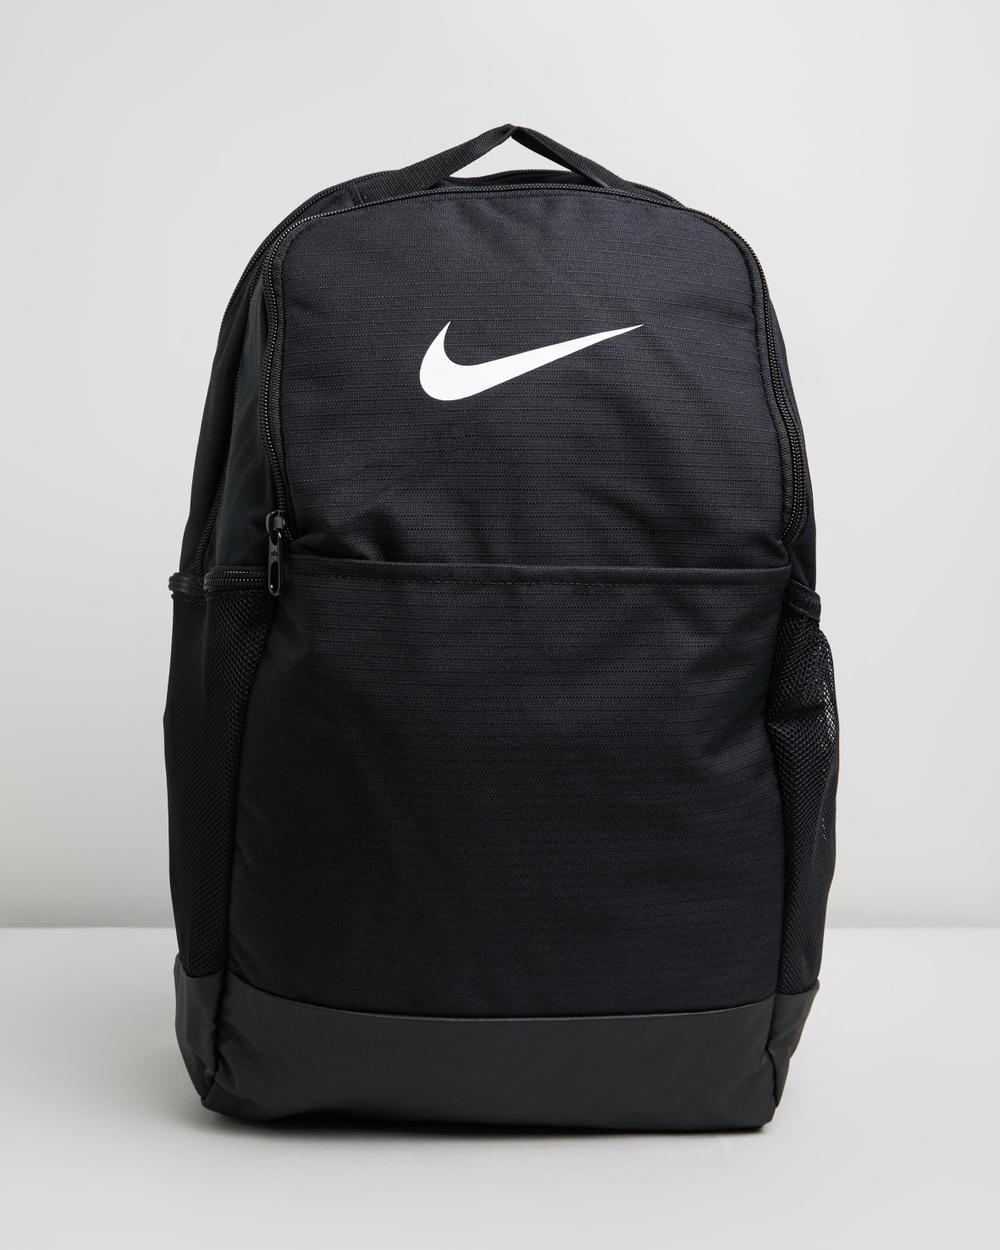 Nike Brasilia Training Backpack Backpacks Black & White